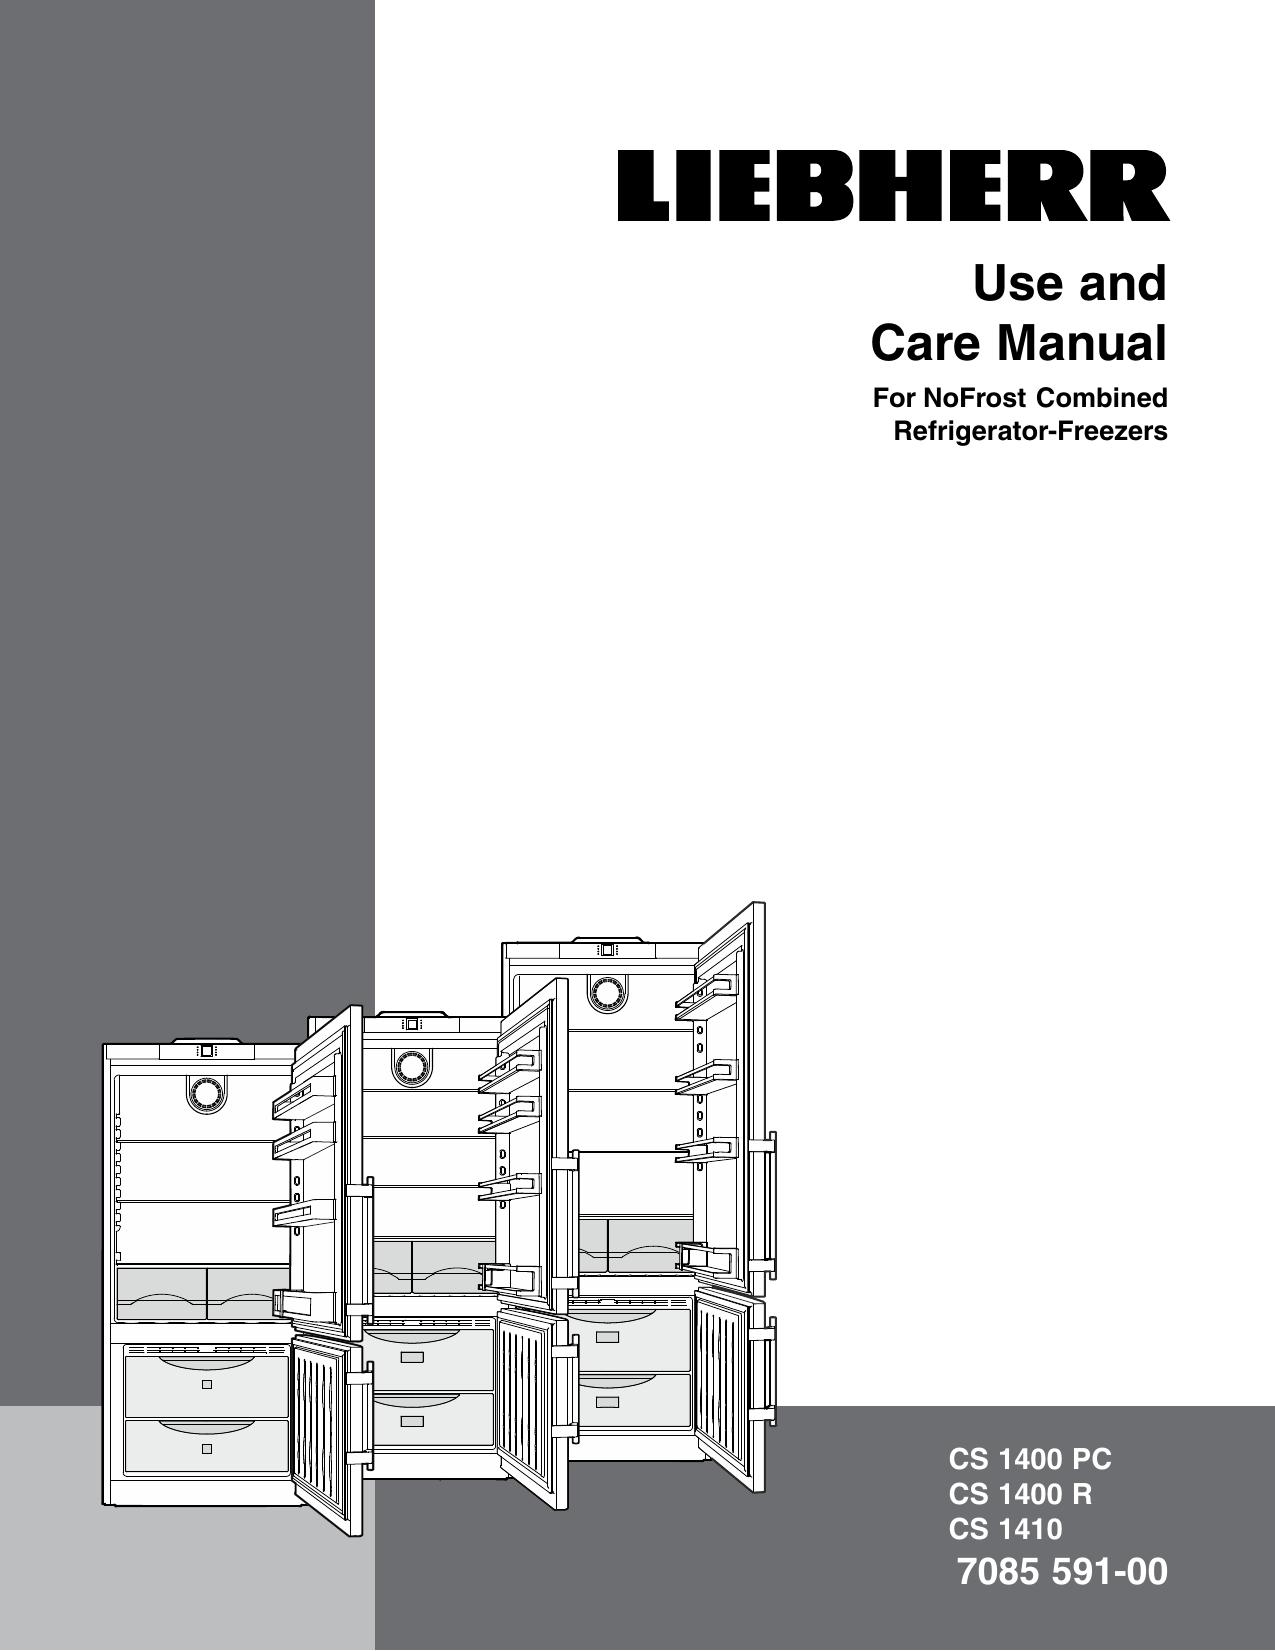 Liebherr CS1410L Use and Care Manual   manualzz com